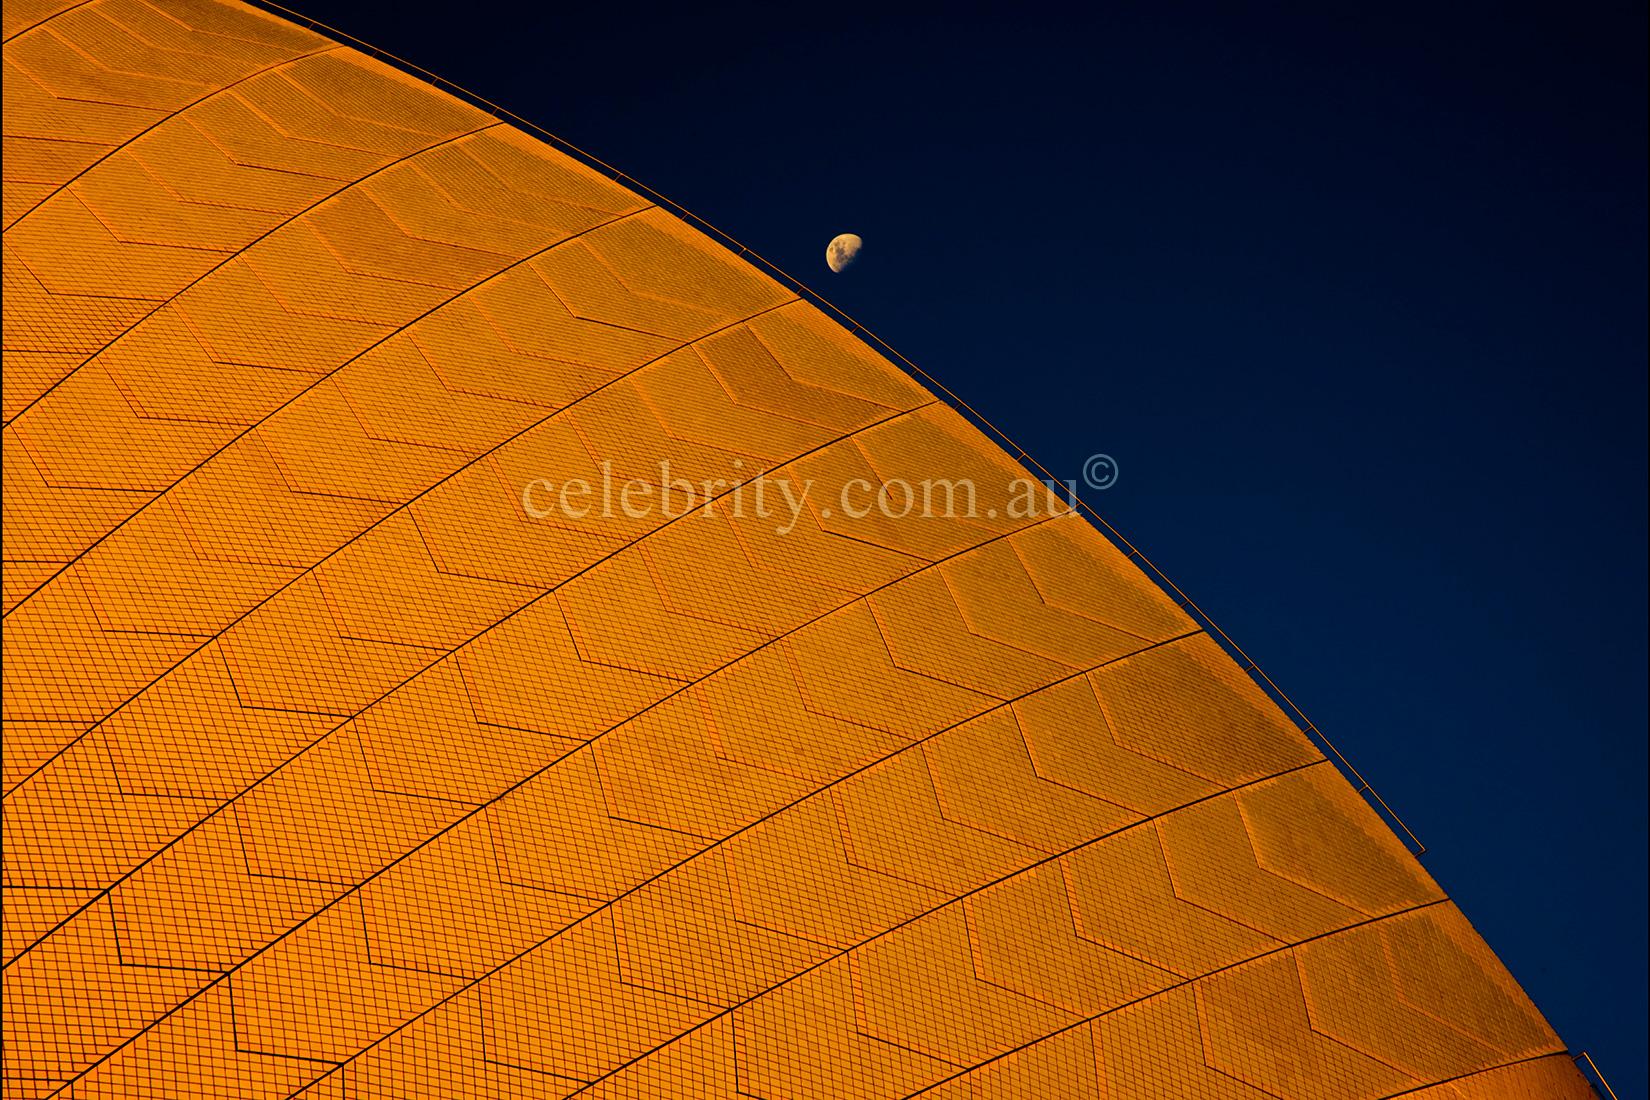 Half Moon Over Sydney Opera House